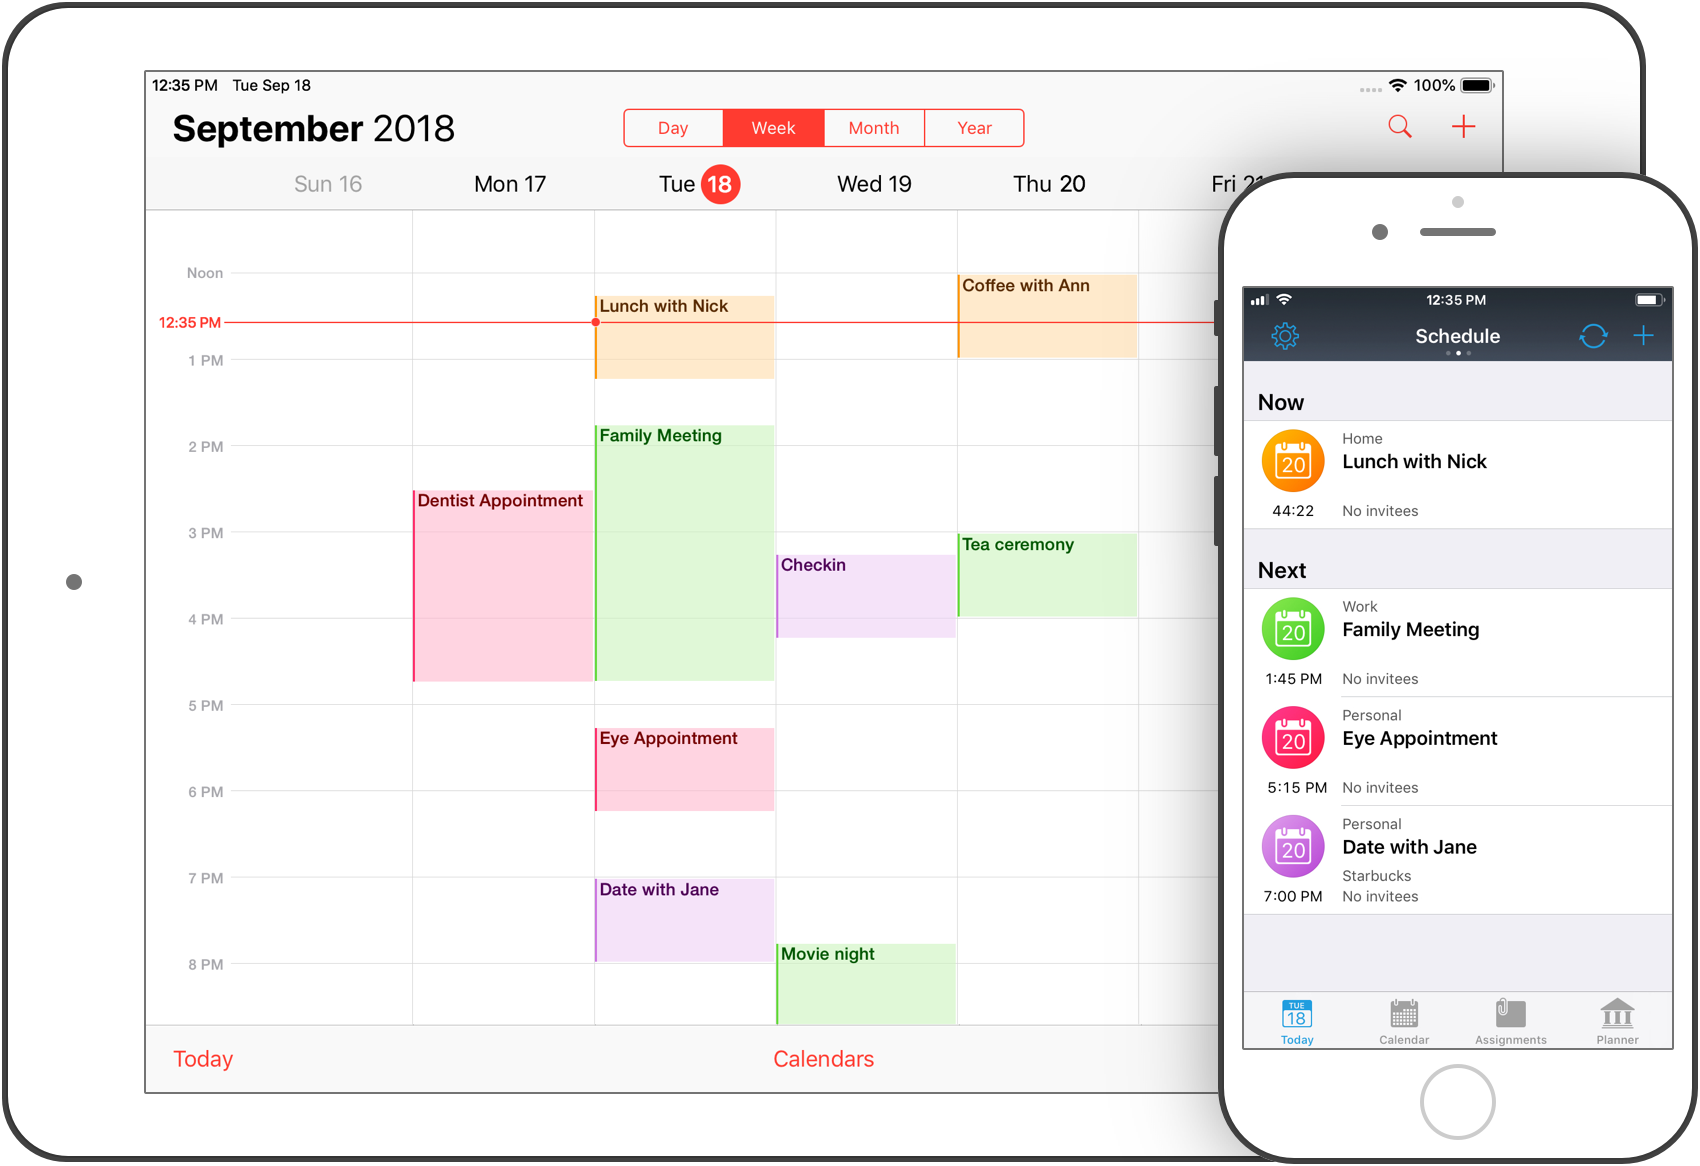 iStudiez Pro for iOS - Best App for Students